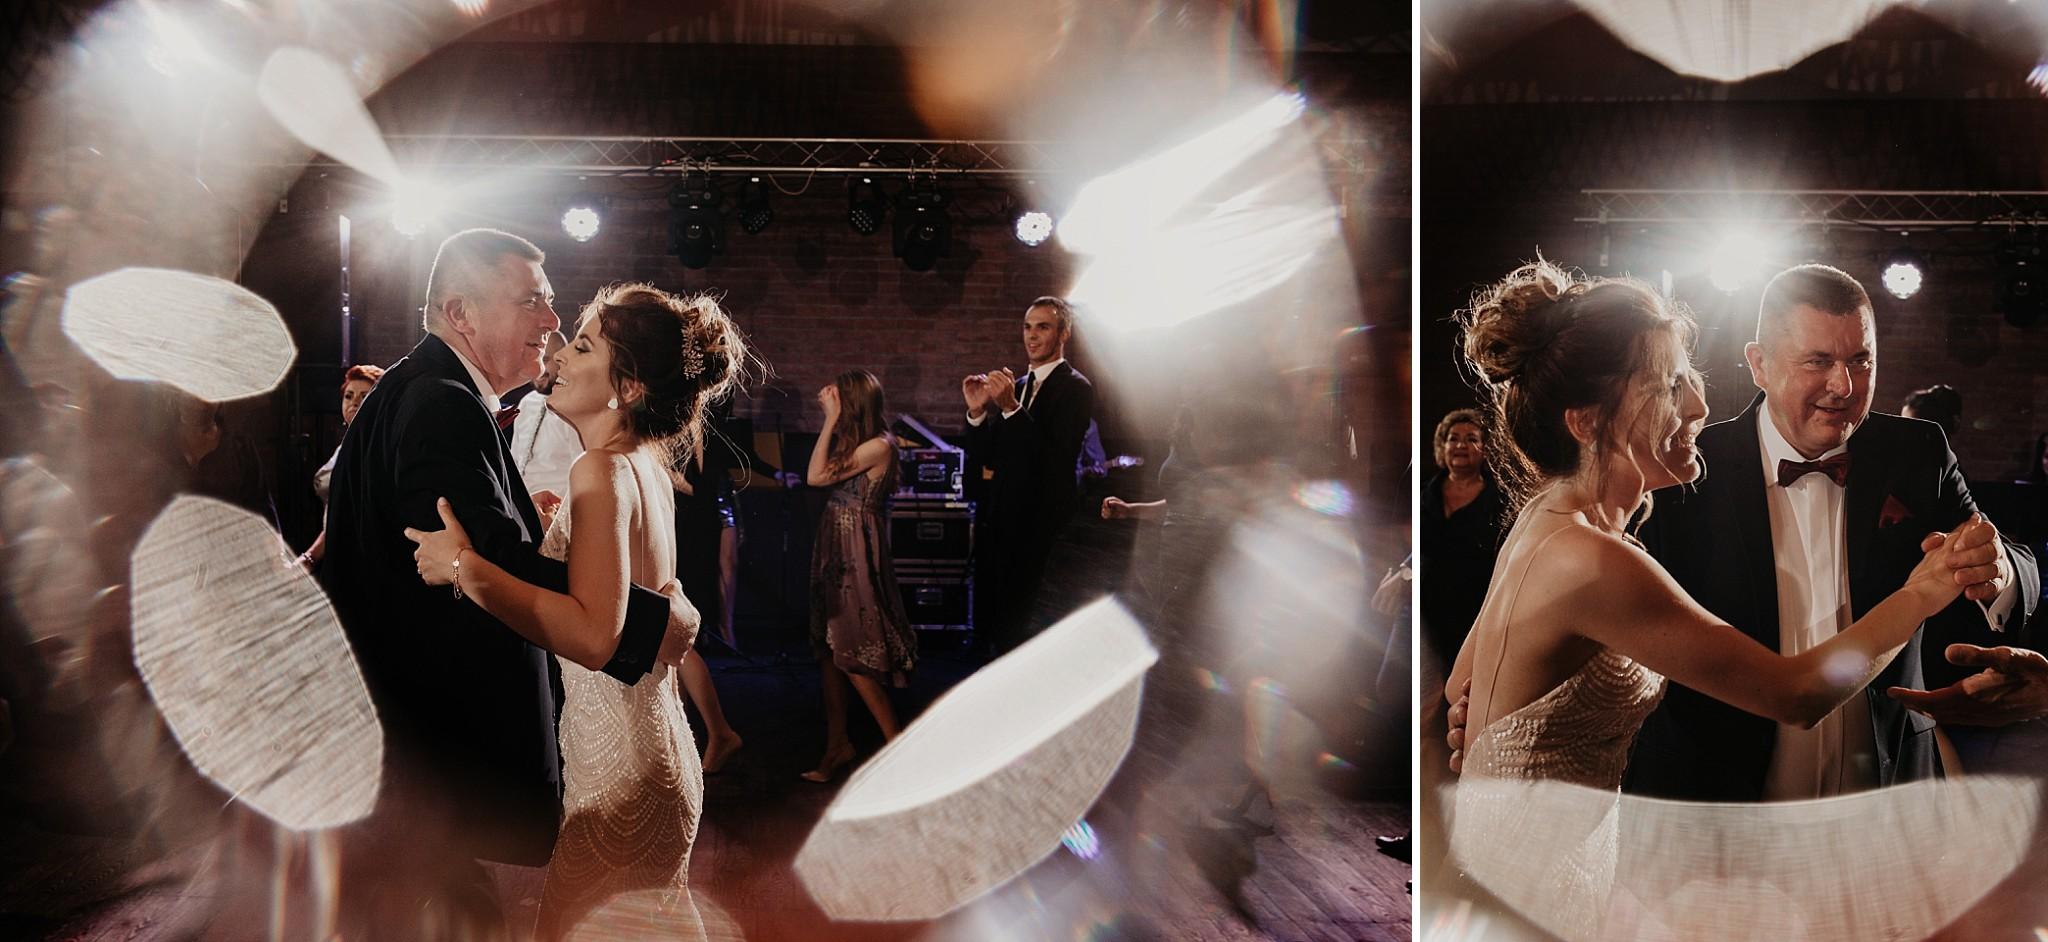 fotograf poznan wesele dobra truskawka piekne wesele pod poznaniem wesele w dobrej truskawce piekna para mloda slub marzen slub koronawirus slub listopad wesele koronawirus 390